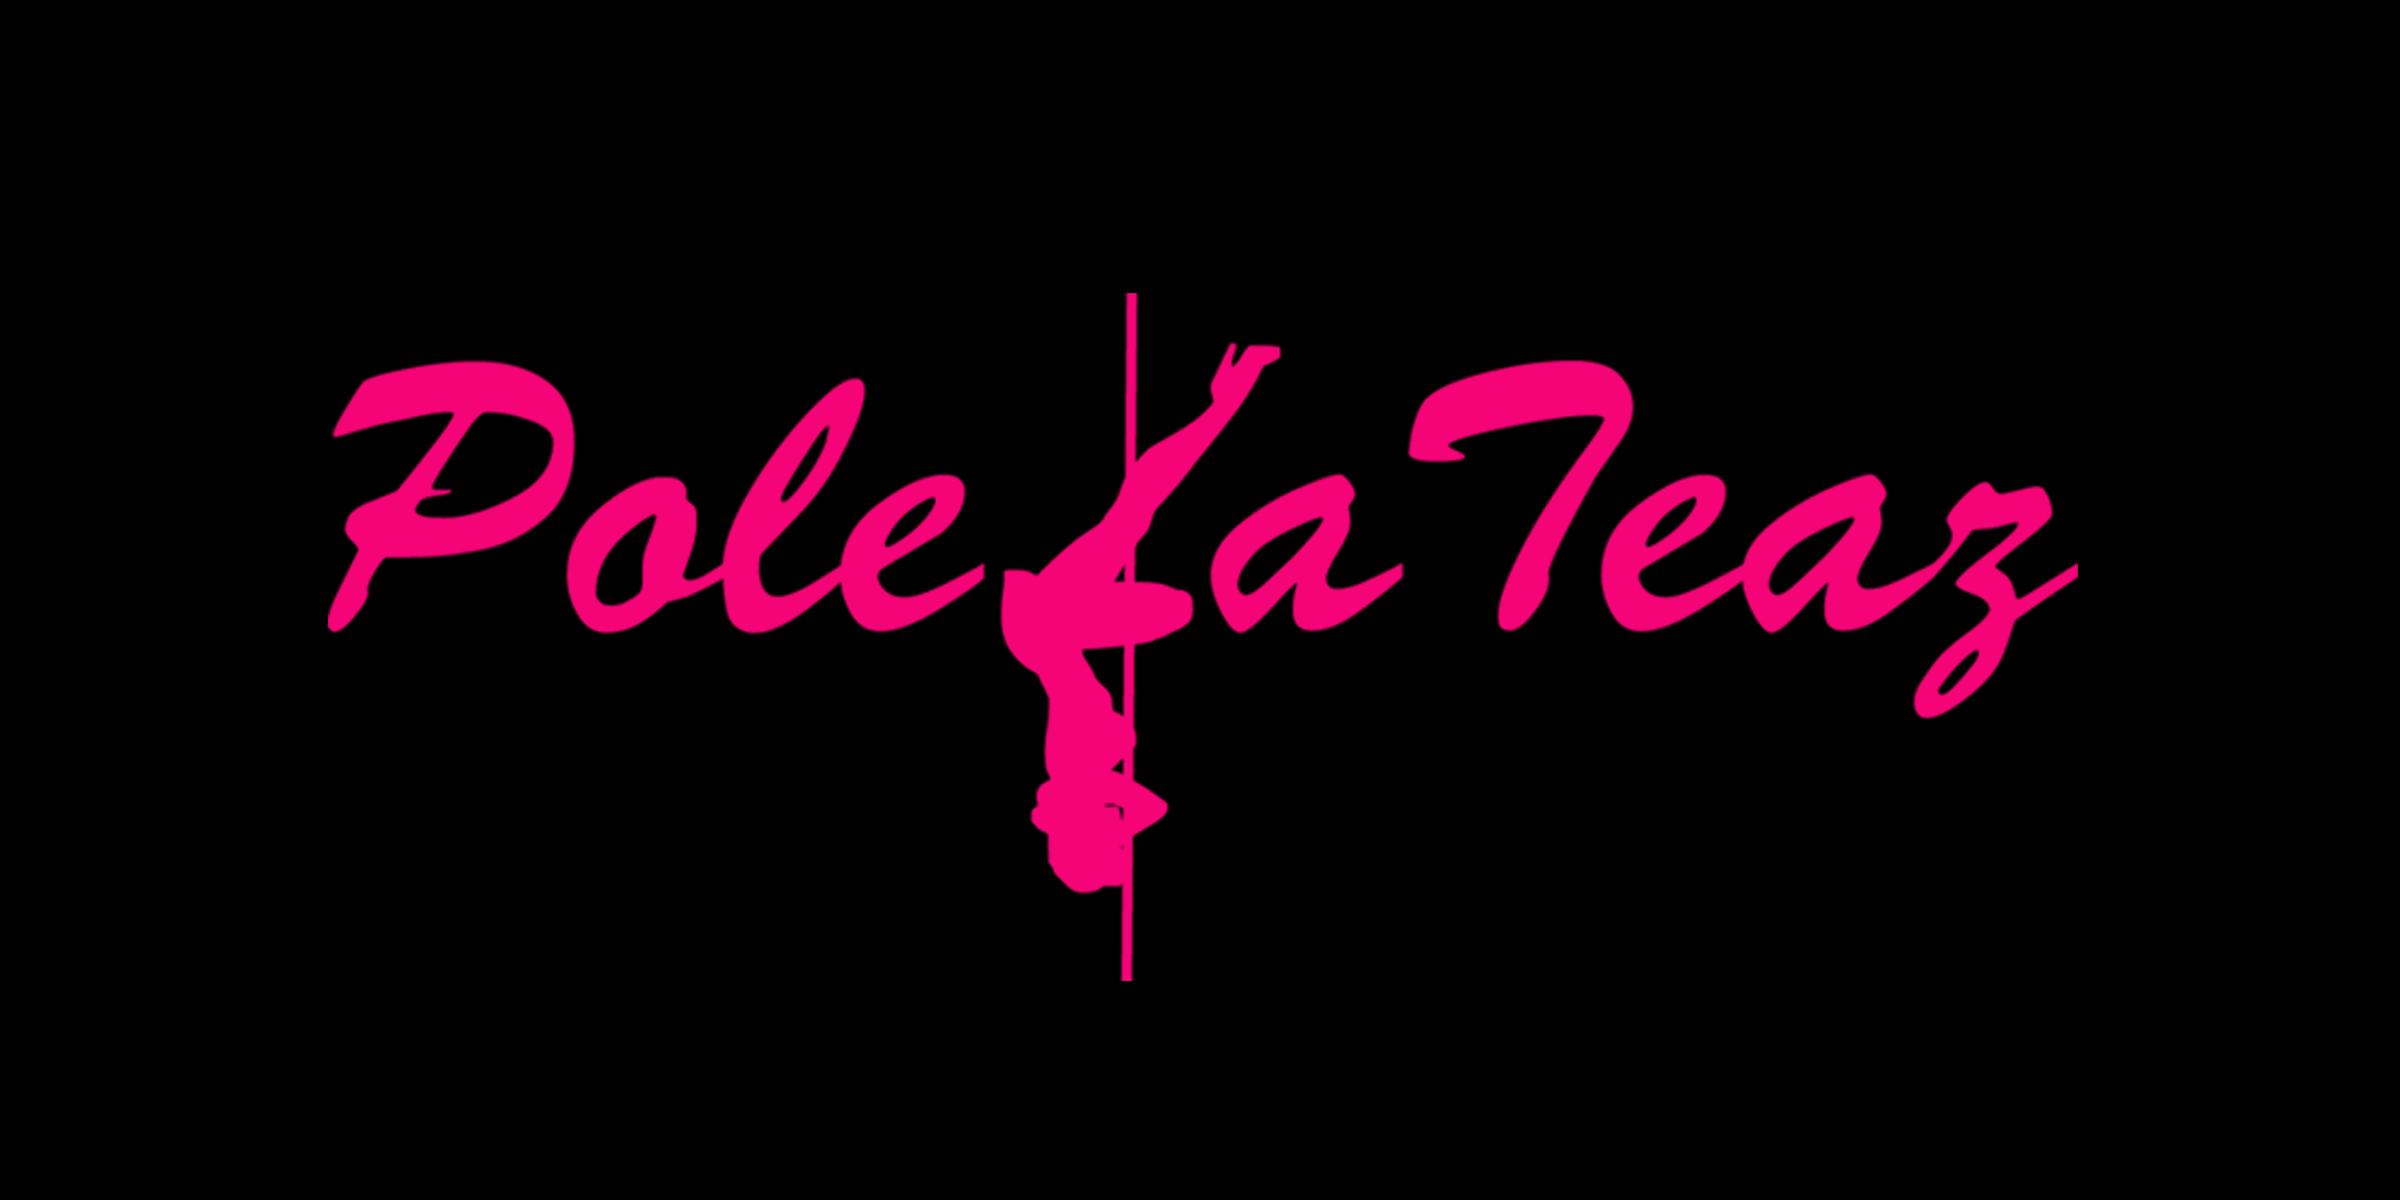 POLELATEAZ DANCE STUDIO - 2700 NE Expy Building C Suite 300 Atlanta Ga 30345